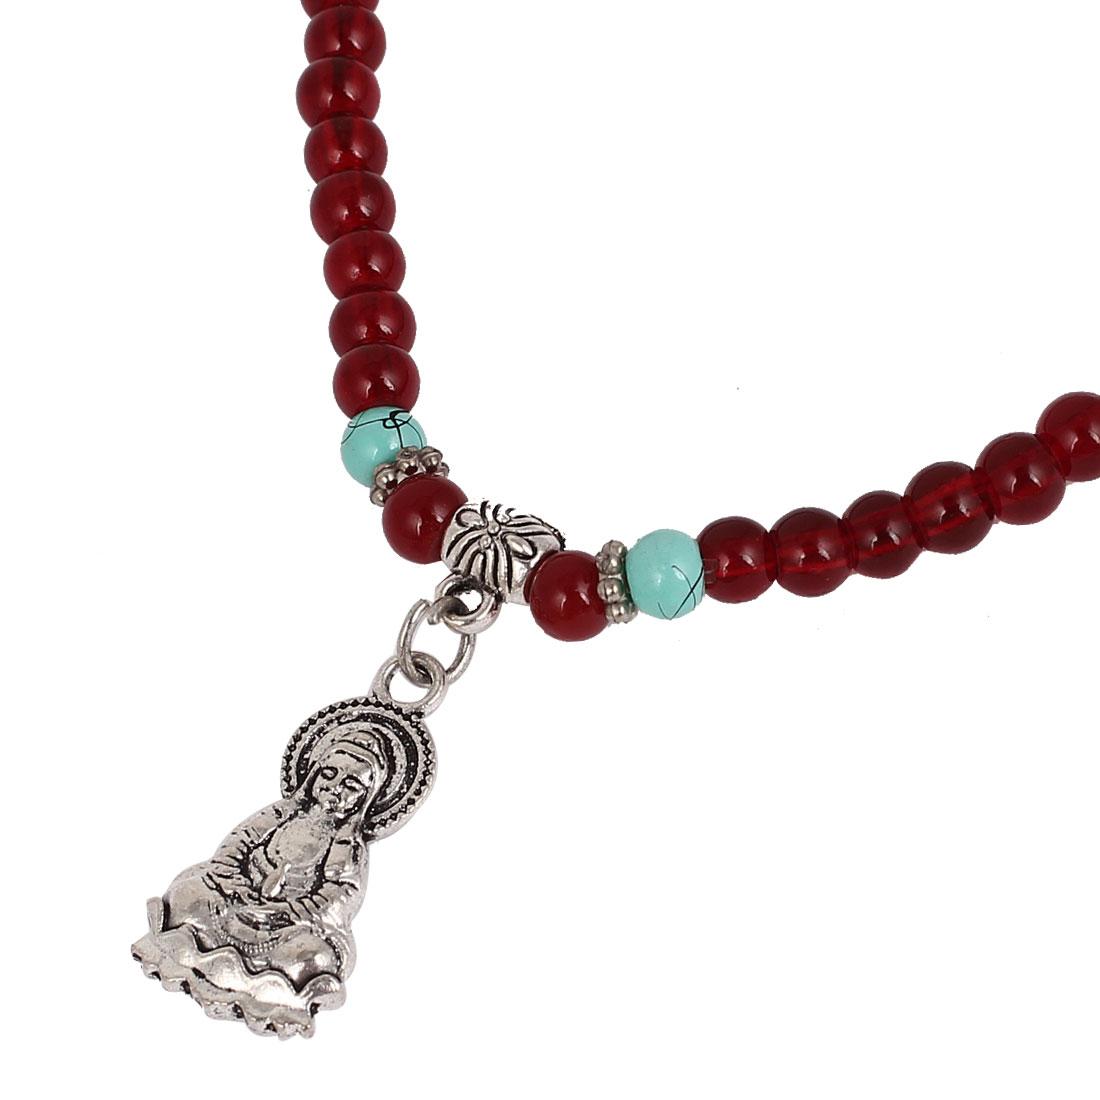 Chinese Guan Yin Buddha Pendant Faux Beaded Elastic Chain Necklace Burgundy